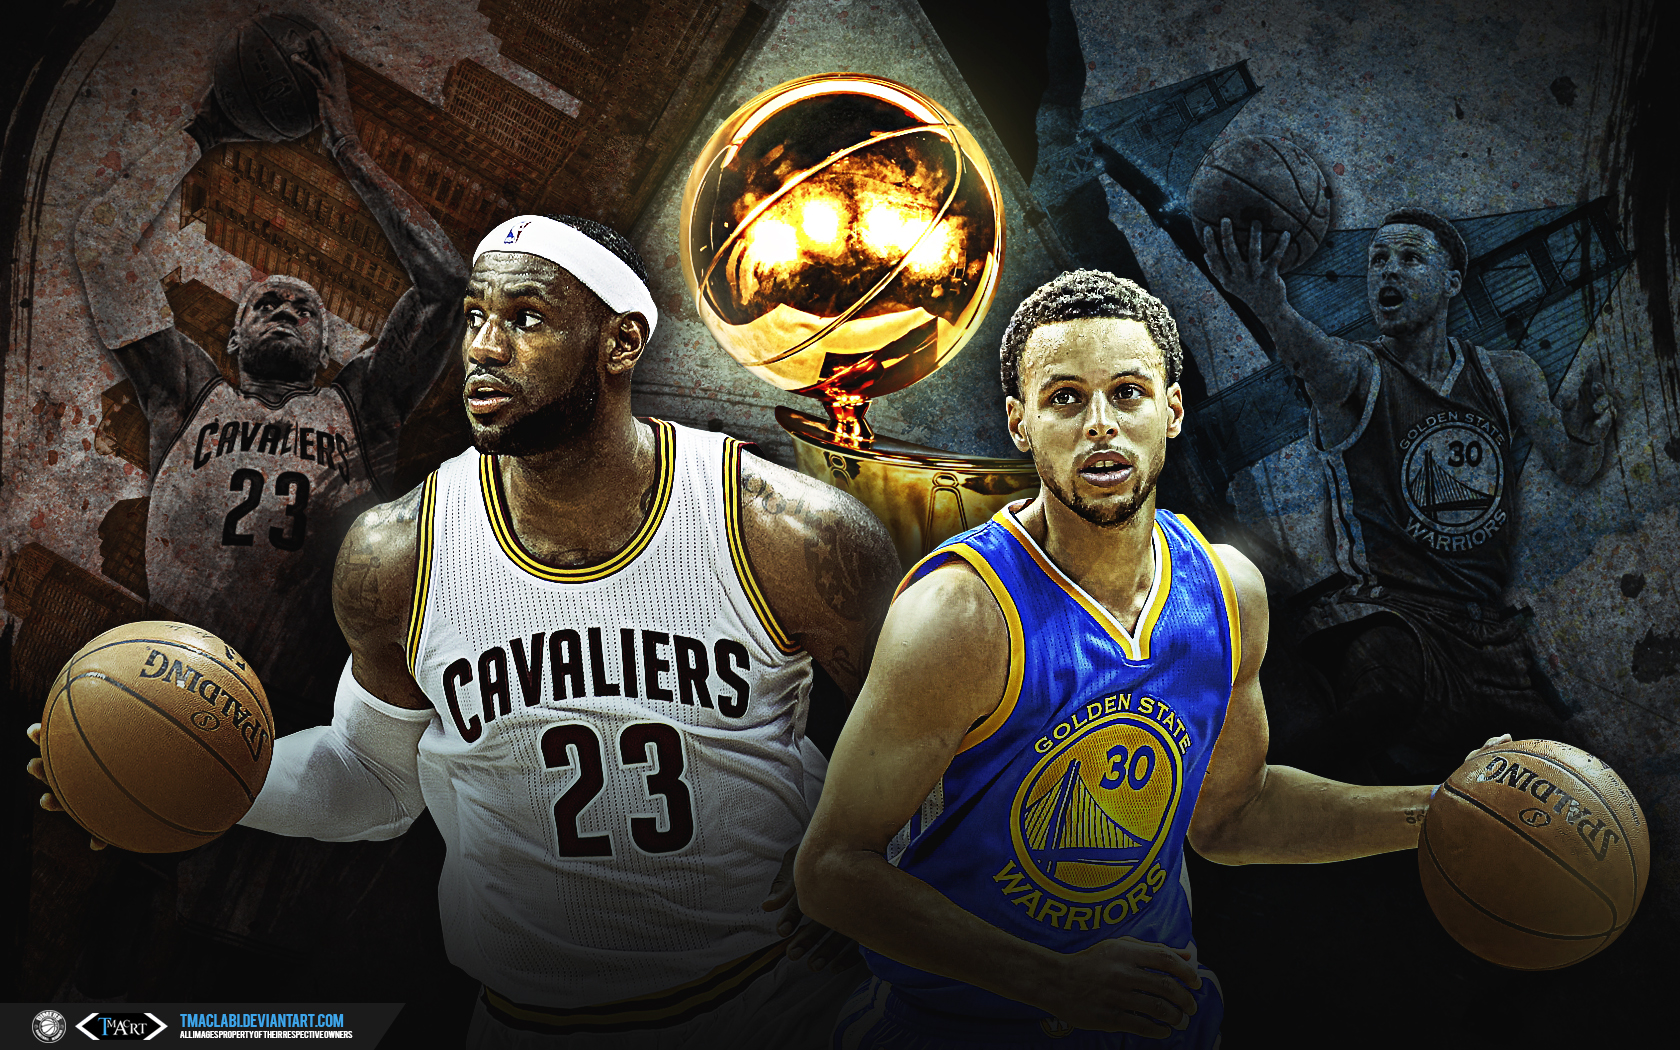 Background image vs img - Jpg 1680x1050 Warriors Vs Cavaliers Finals Background